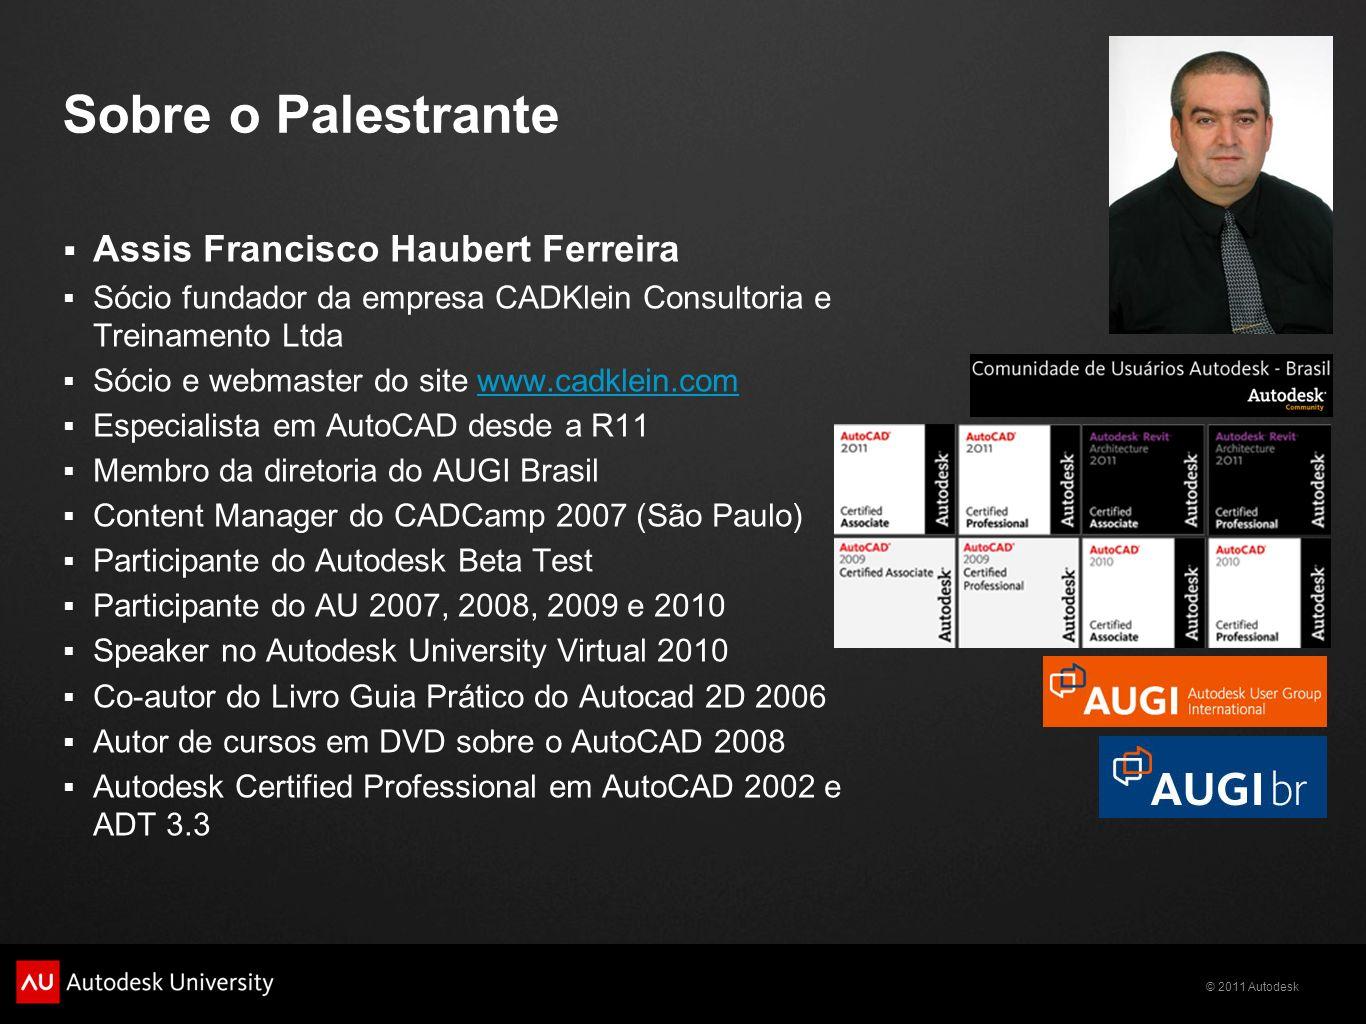 Sobre o Palestrante Assis Francisco Haubert Ferreira